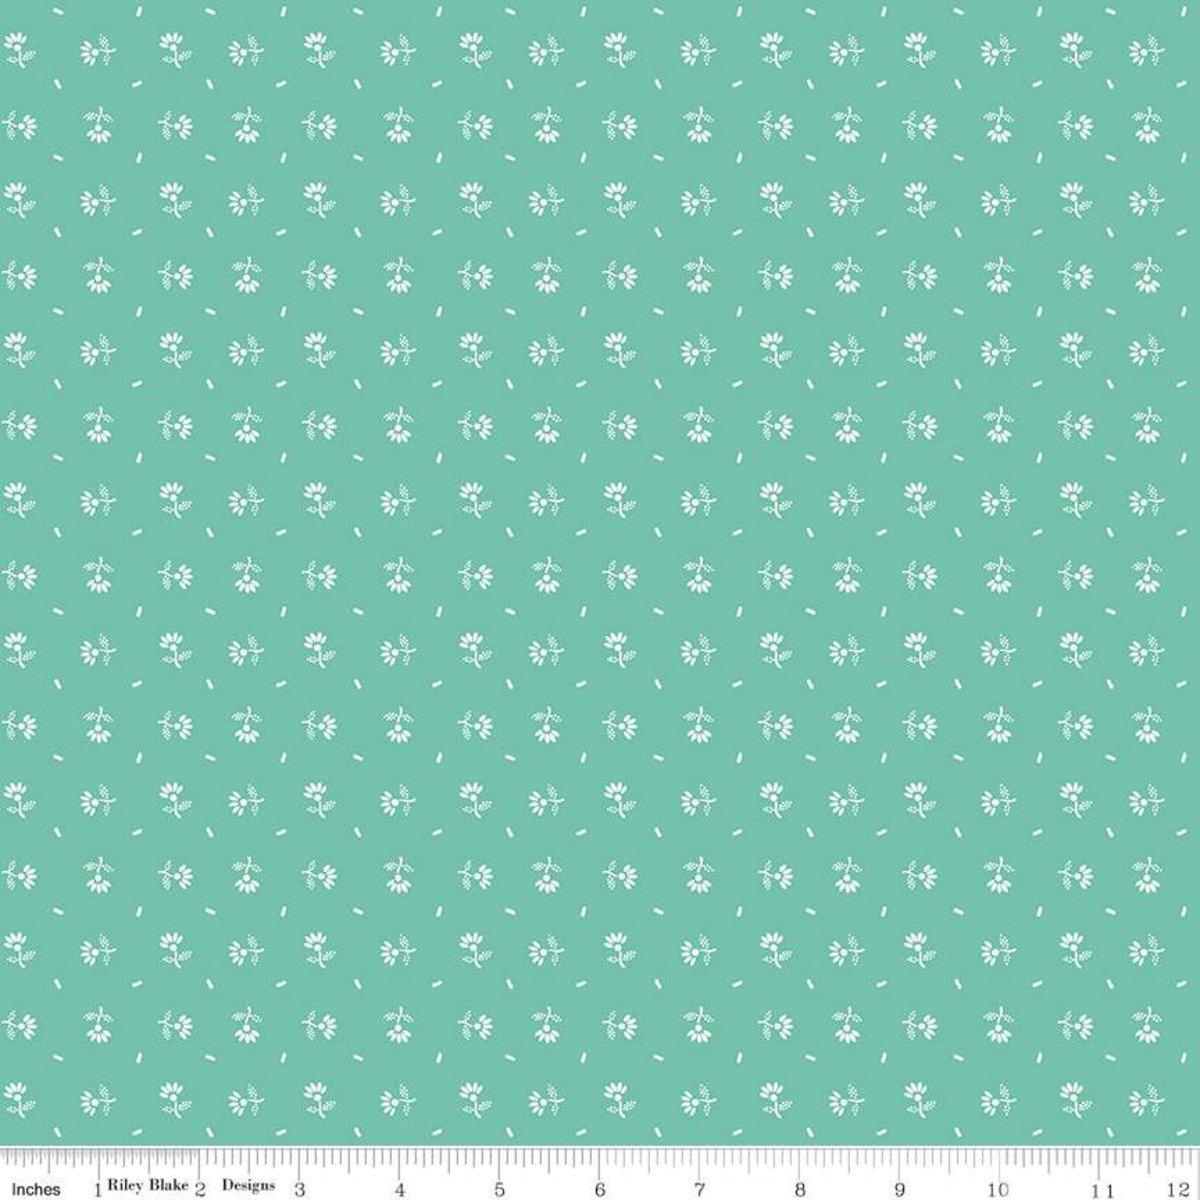 Prim C9694 Daisy Sea Glass by Lori Holt for Riley Blake Designs